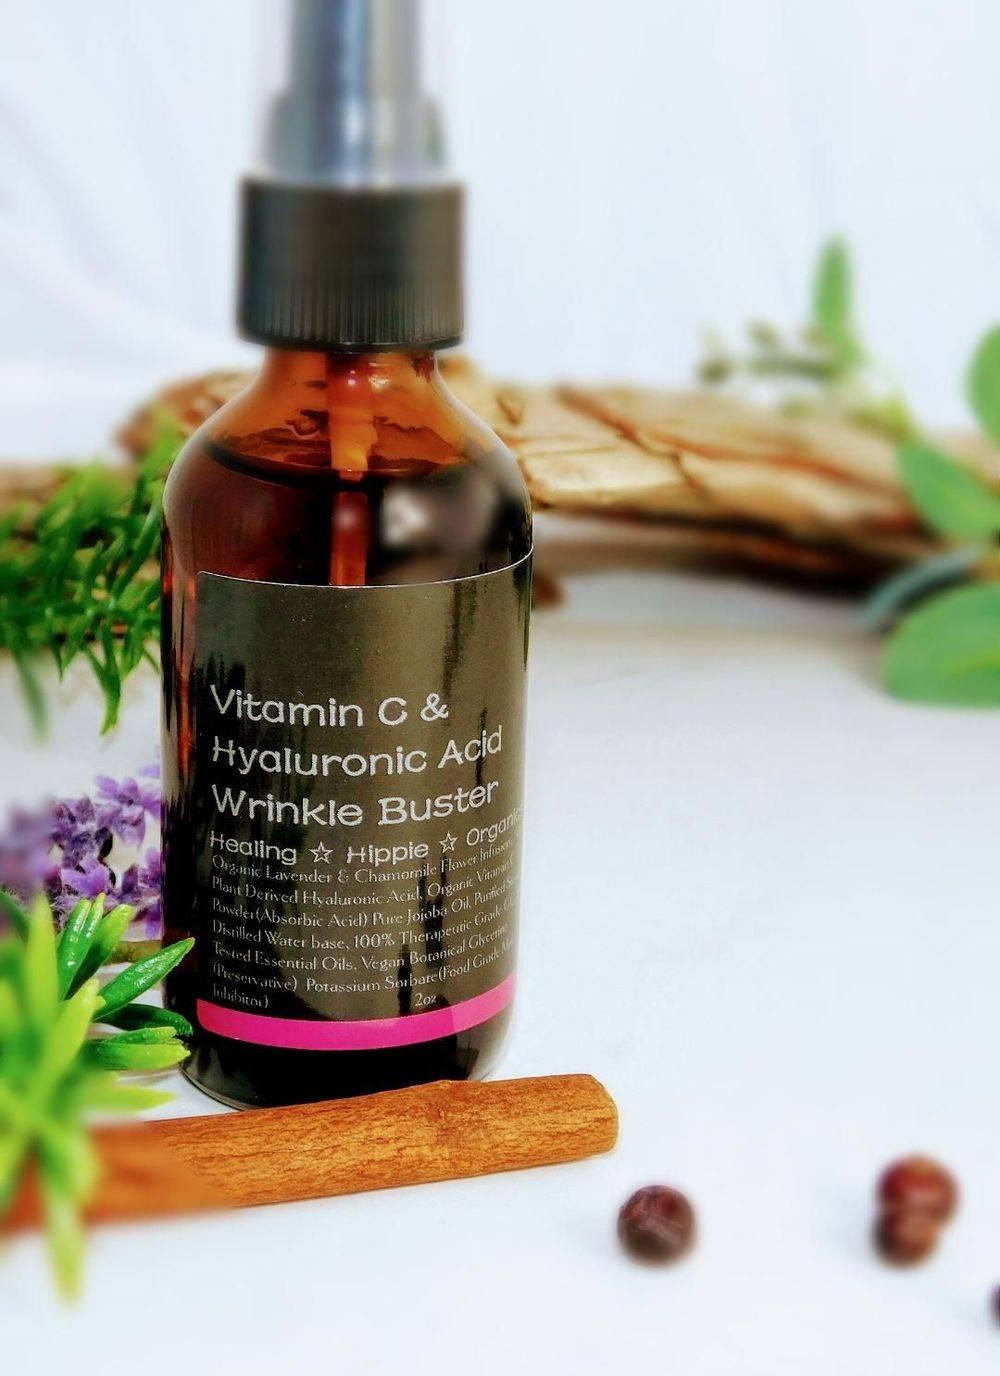 Skyn Wrinkle Serum, Healing Hippie Organics, Boise, Idaho, USA